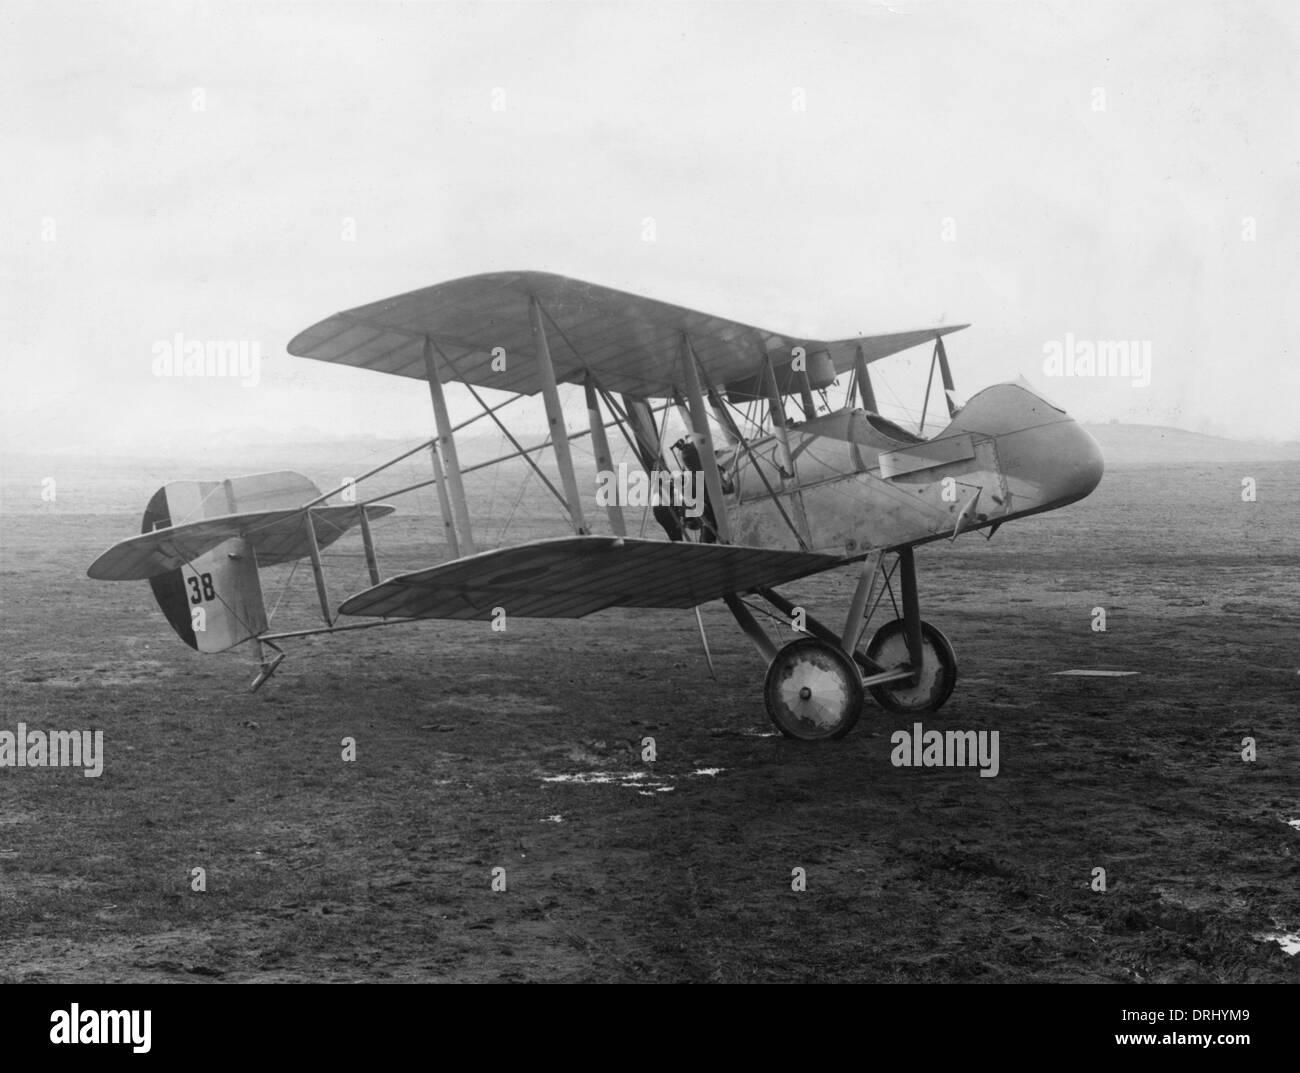 Airco DH2 De Havilland biplane on an airfield, WW1 - Stock Image